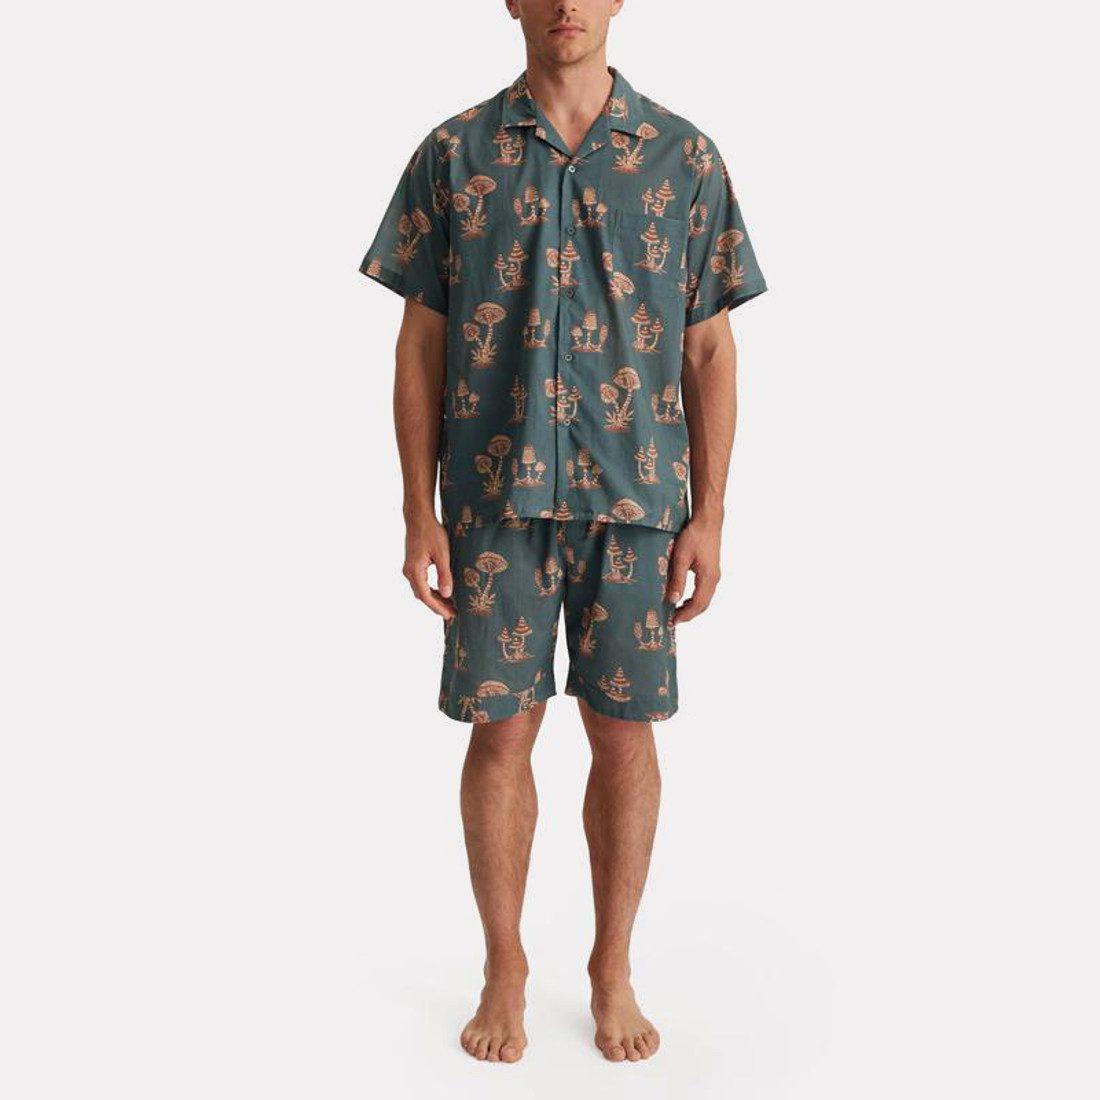 cuban-mushroom-shirt_bm_1_1